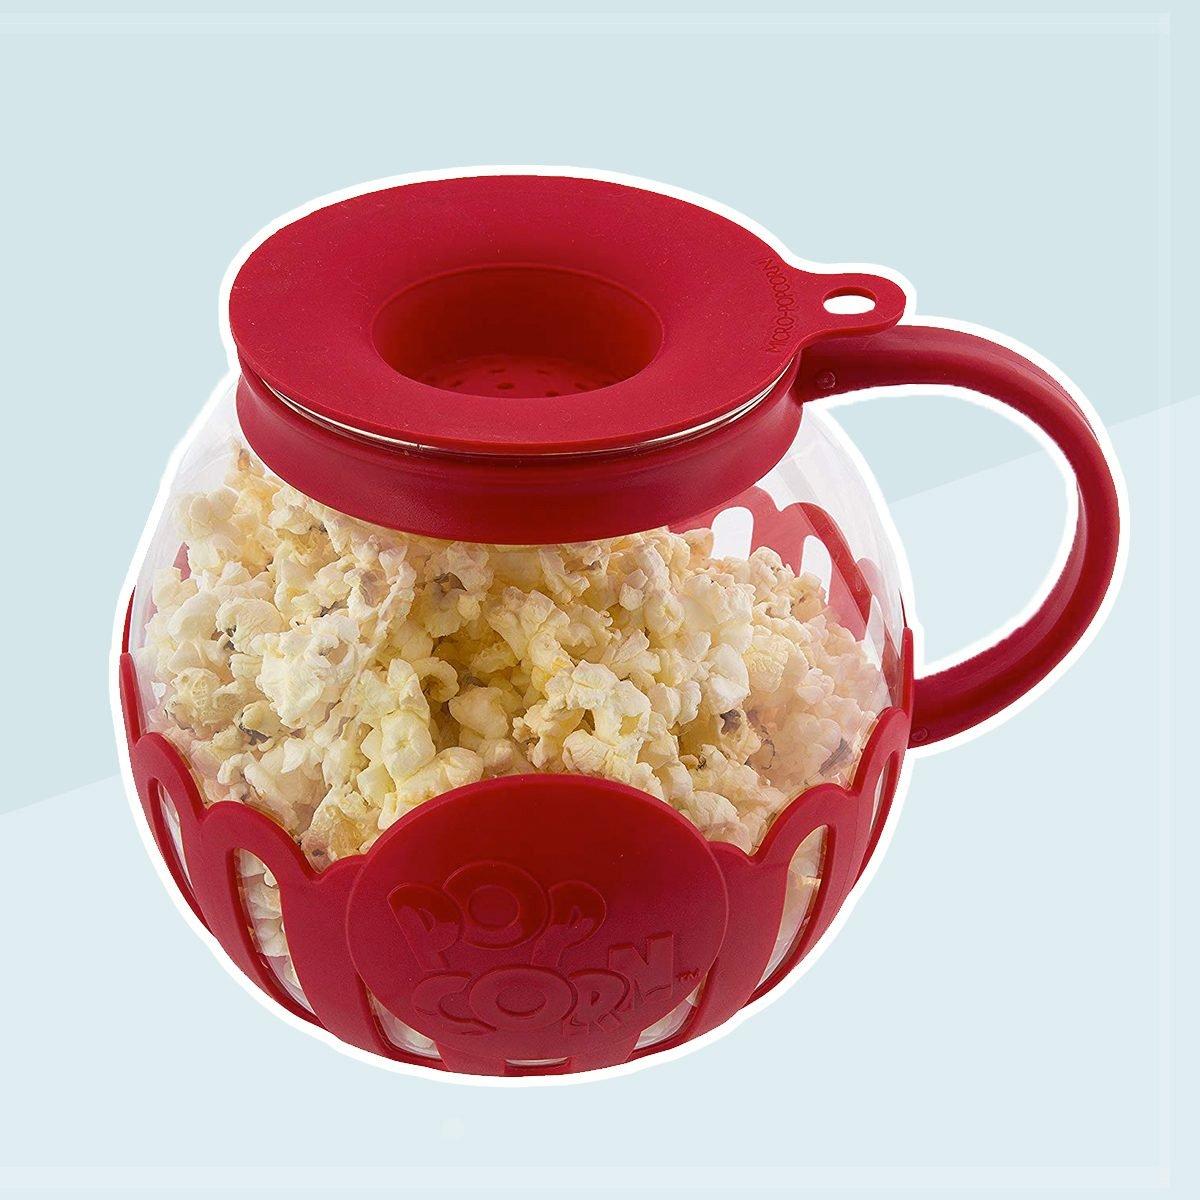 Ecolution EKPRE-4215 Micro-Pop Glass Popcorn Popper-Maker Large, 1.5 Qt-Snack Size, Eco-Friendly, Red